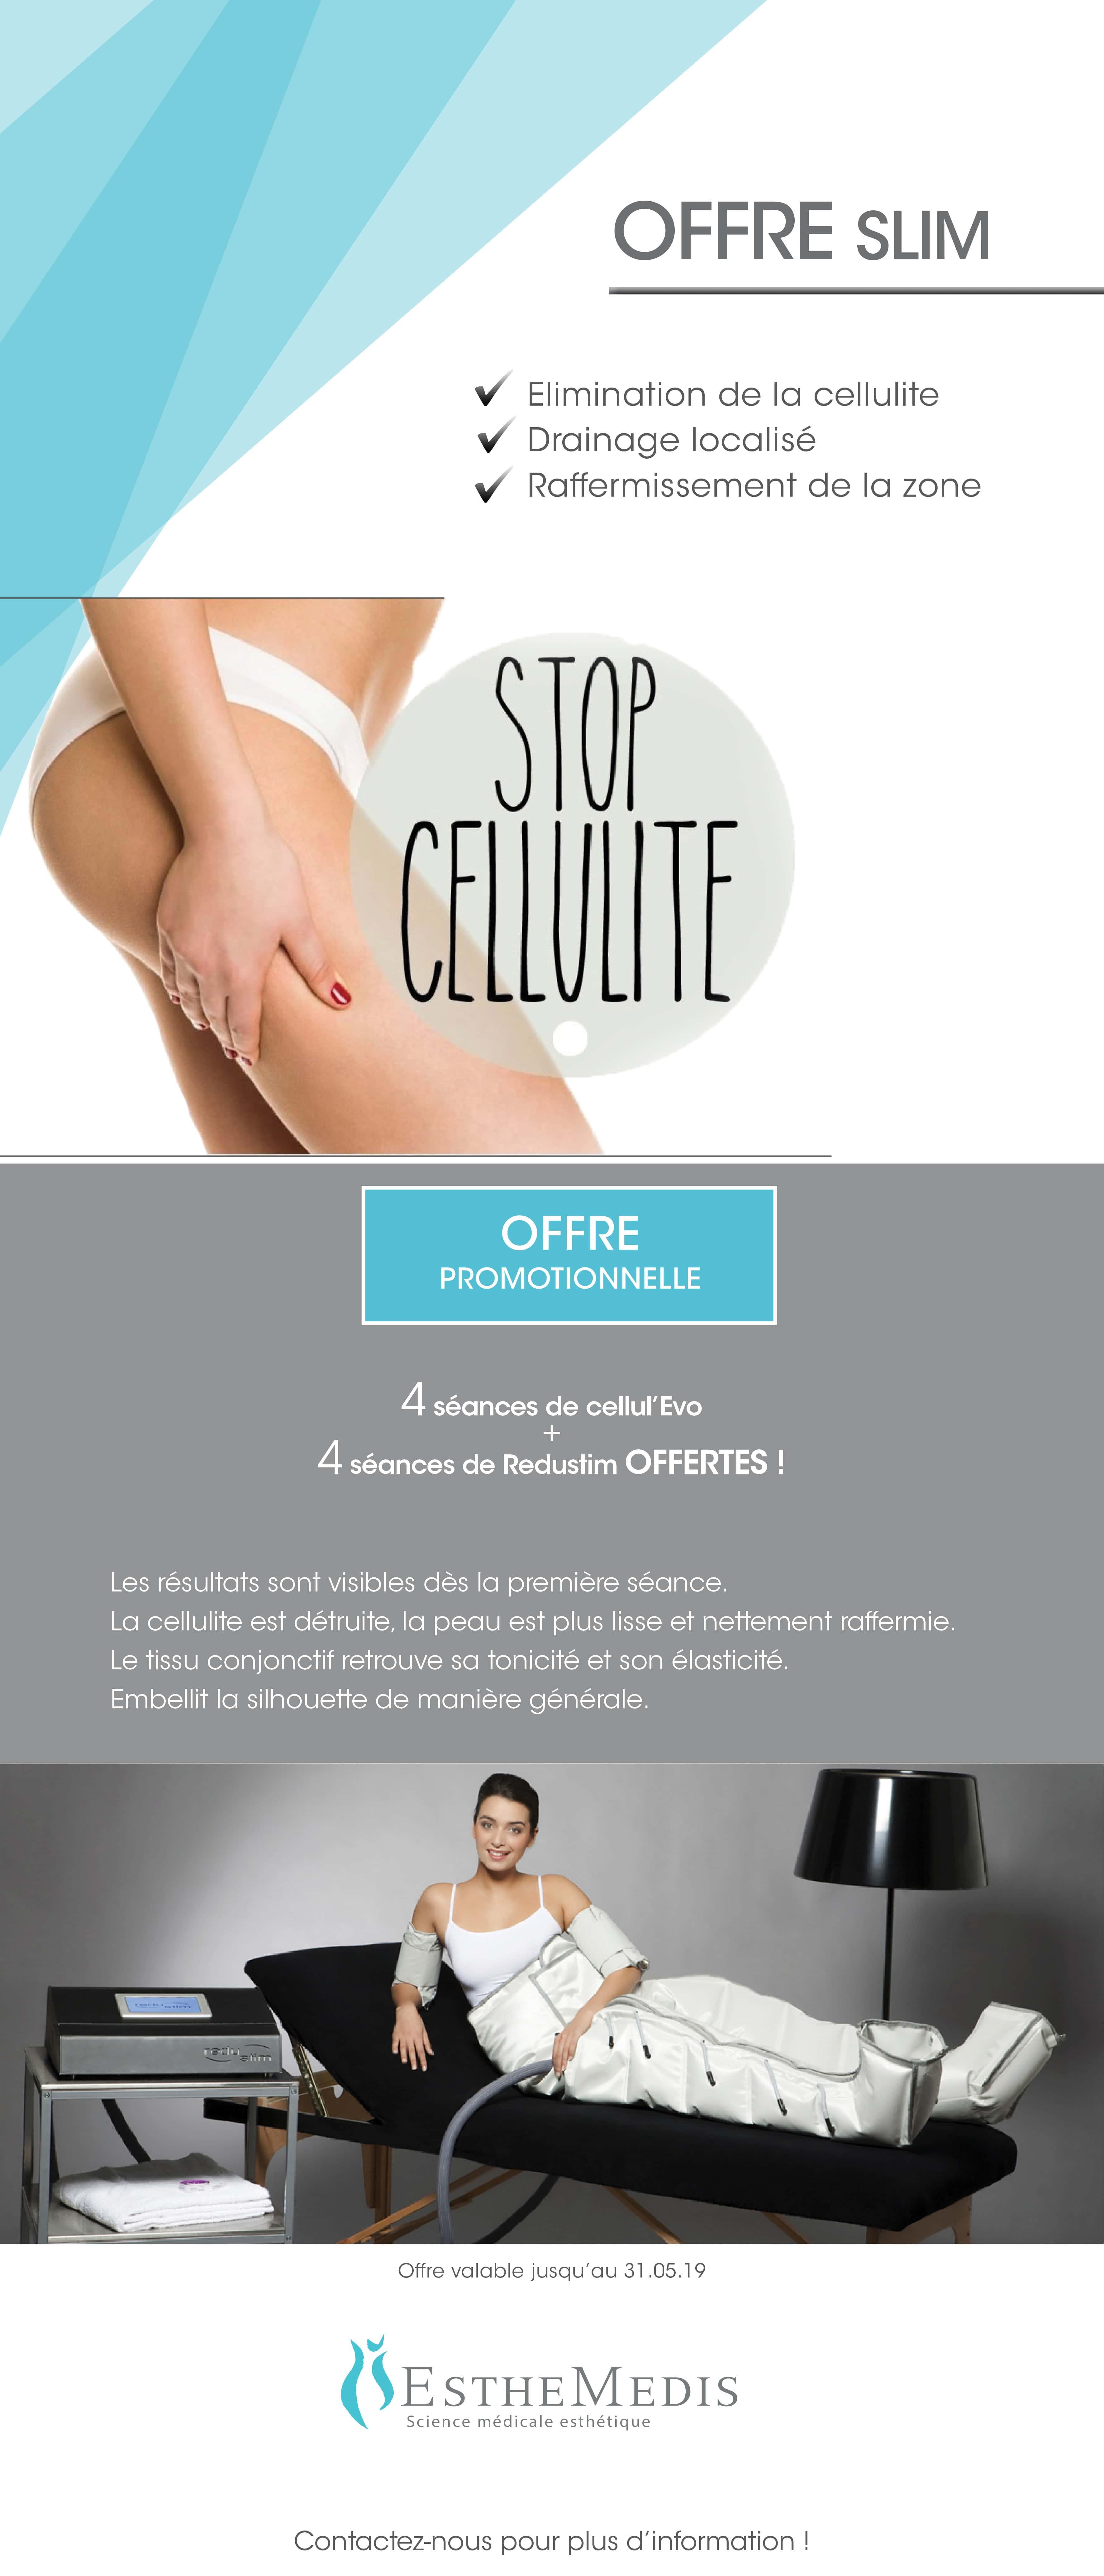 Offre Slim (Vaud)